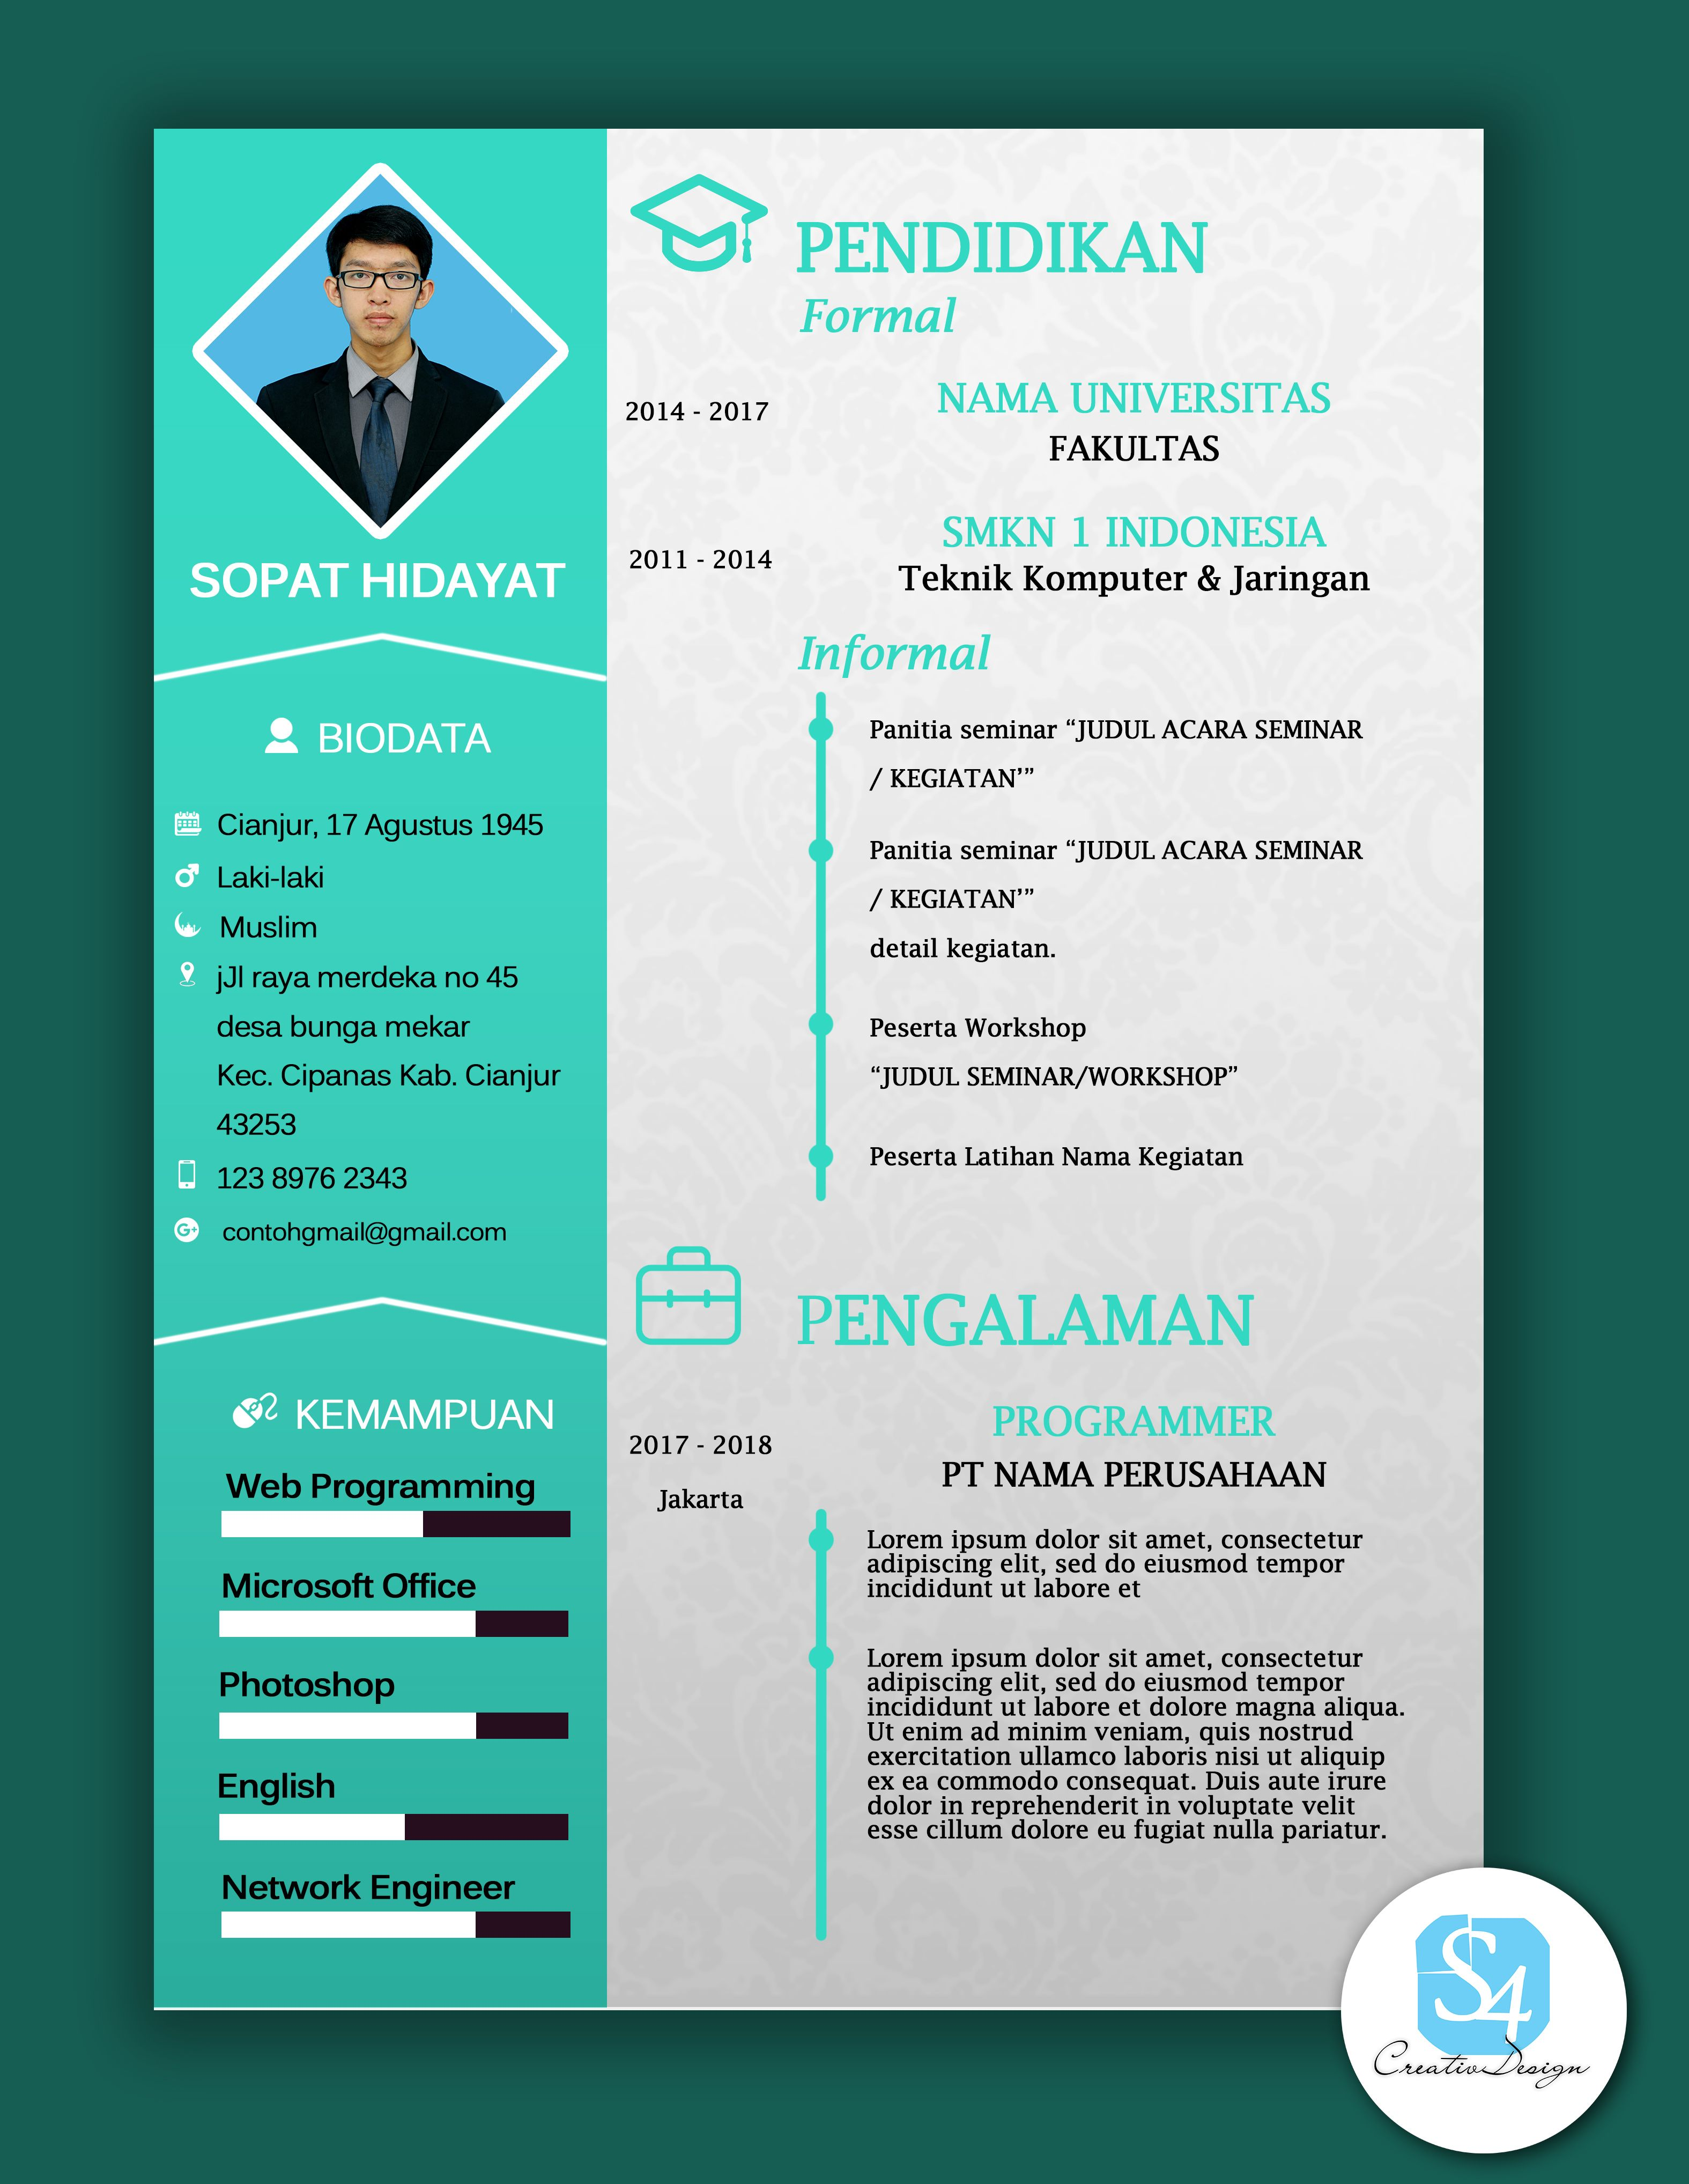 Resume Cv Design Template With Green Color Create Creative And Profesional Design Template With Photoshop Teknik Komputer Teknik Pendidikan